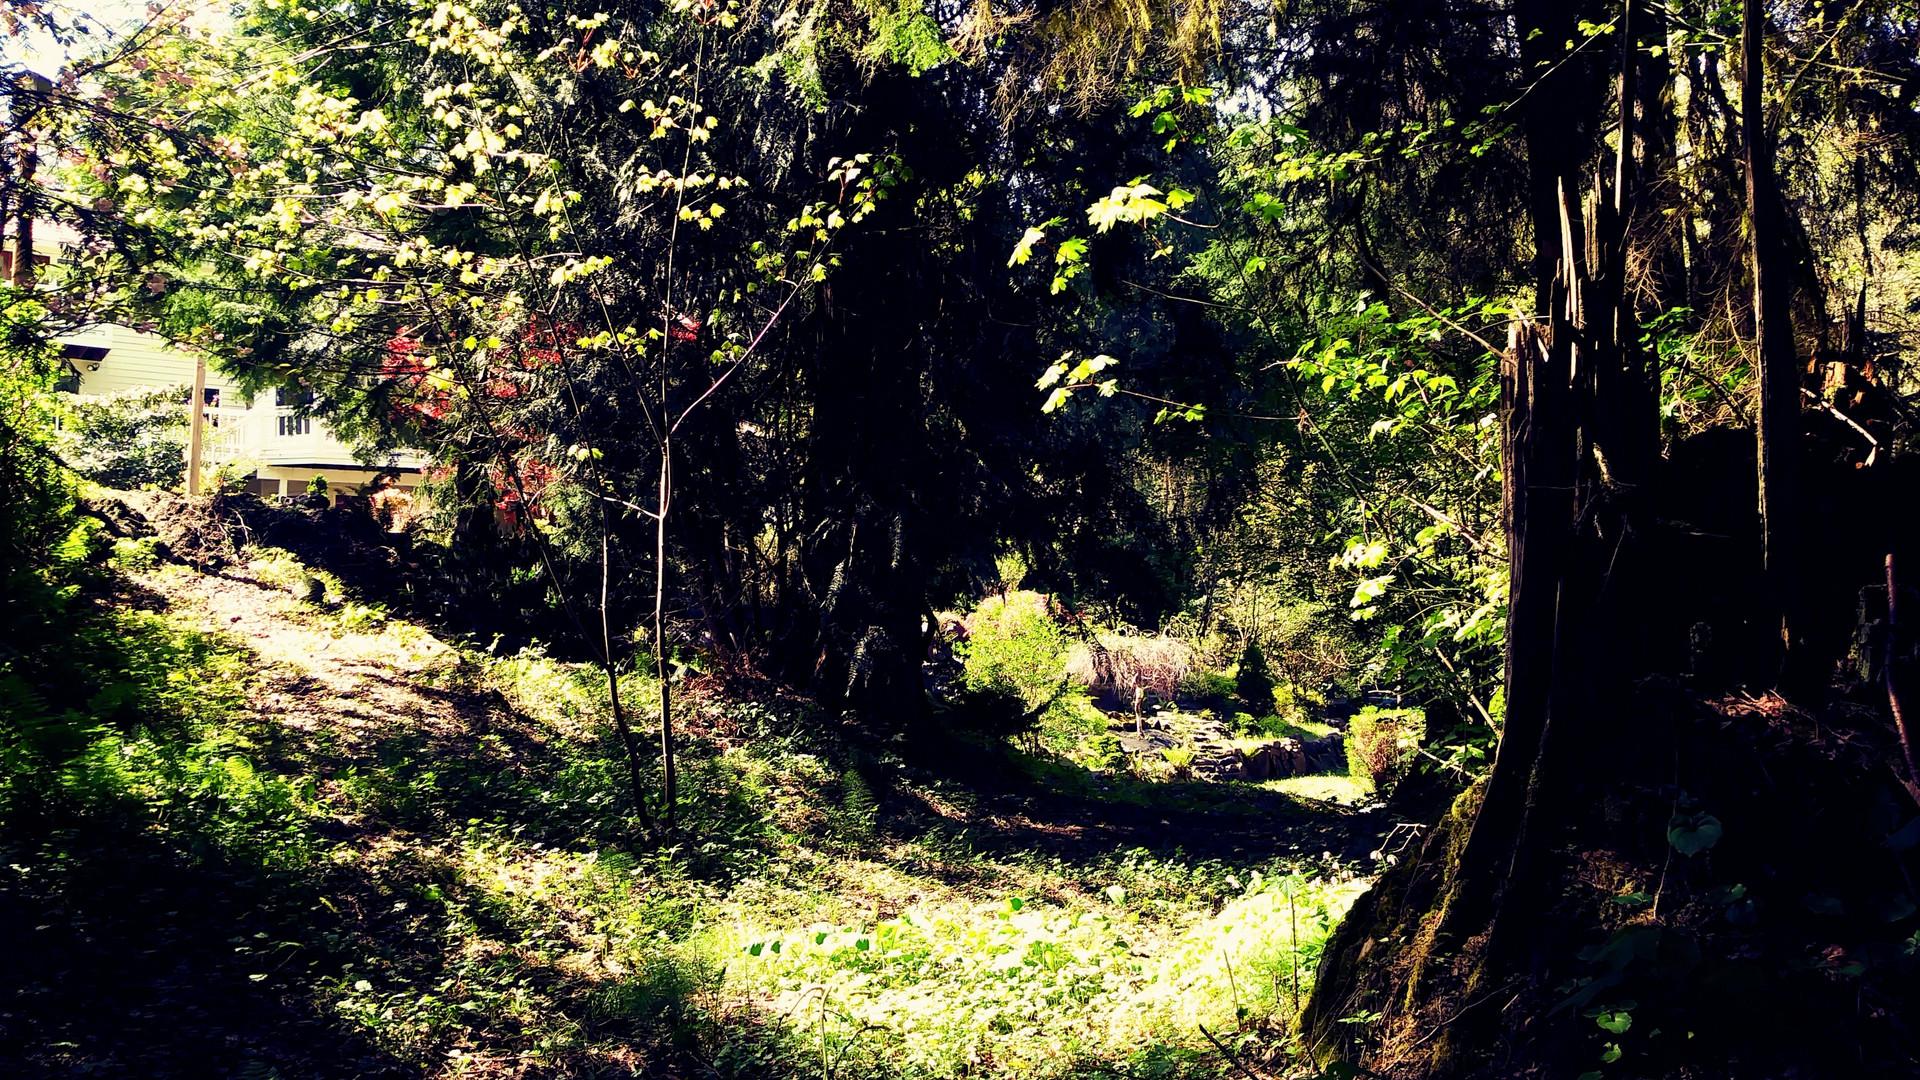 Secret path to the woodland fairies